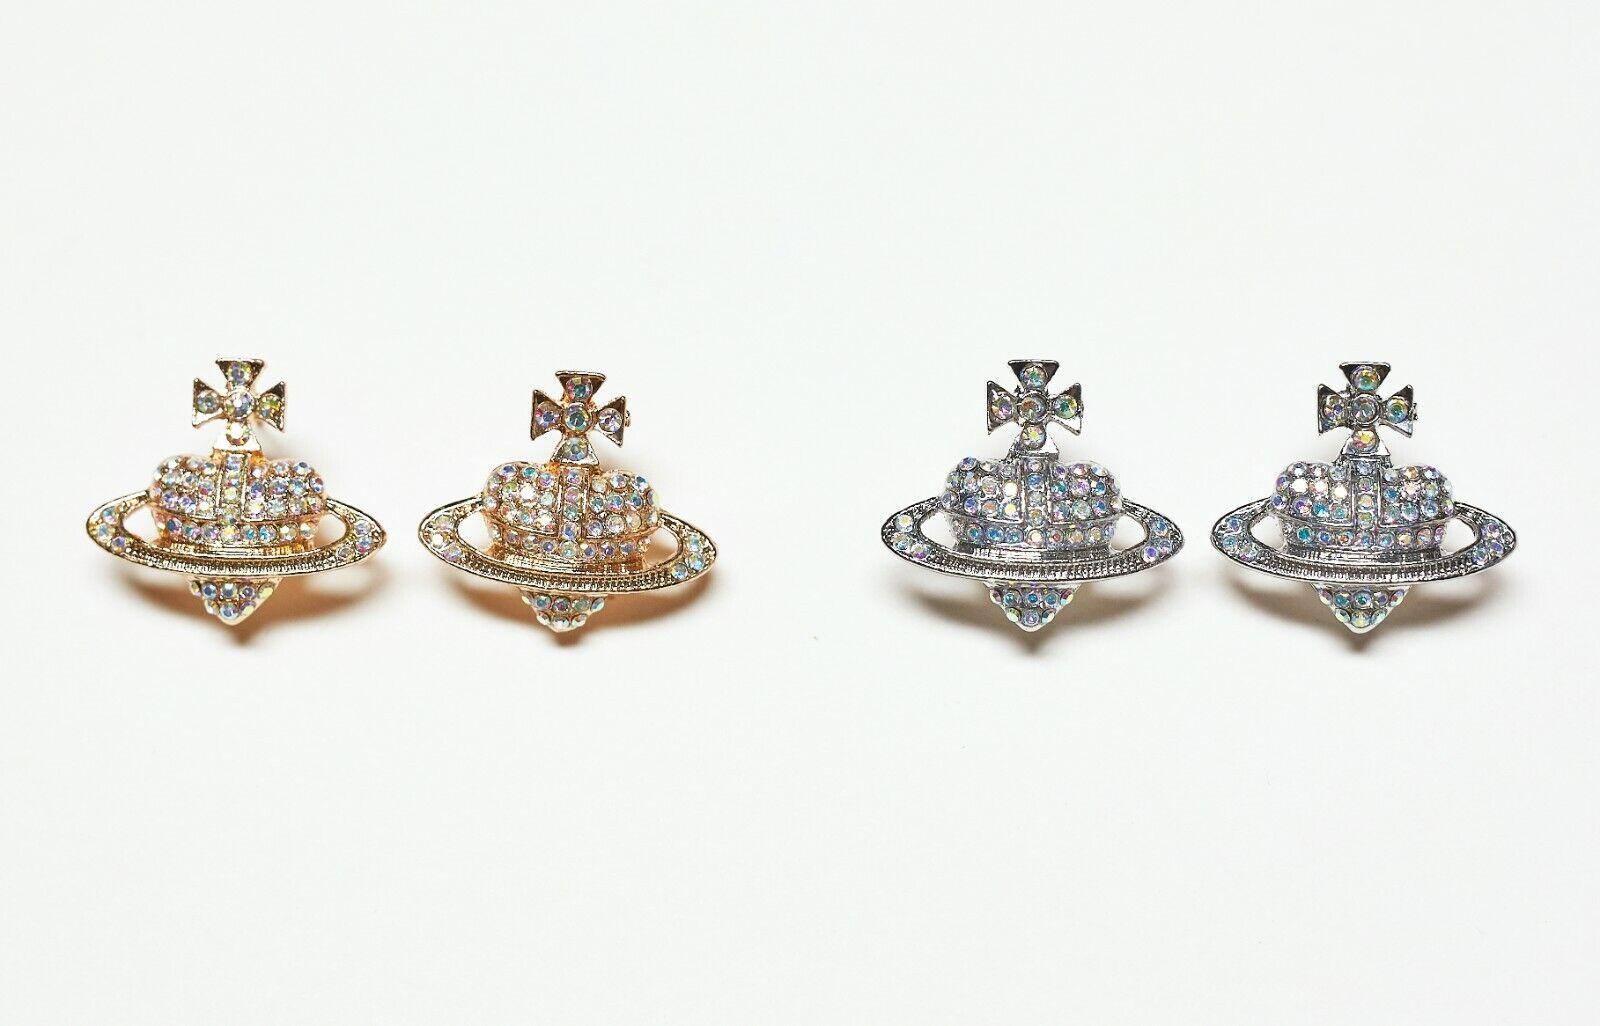 Jewellery - Crystal Saturn Heart Planet Orb Earrings Stud Jewellery Silver Gold Colour